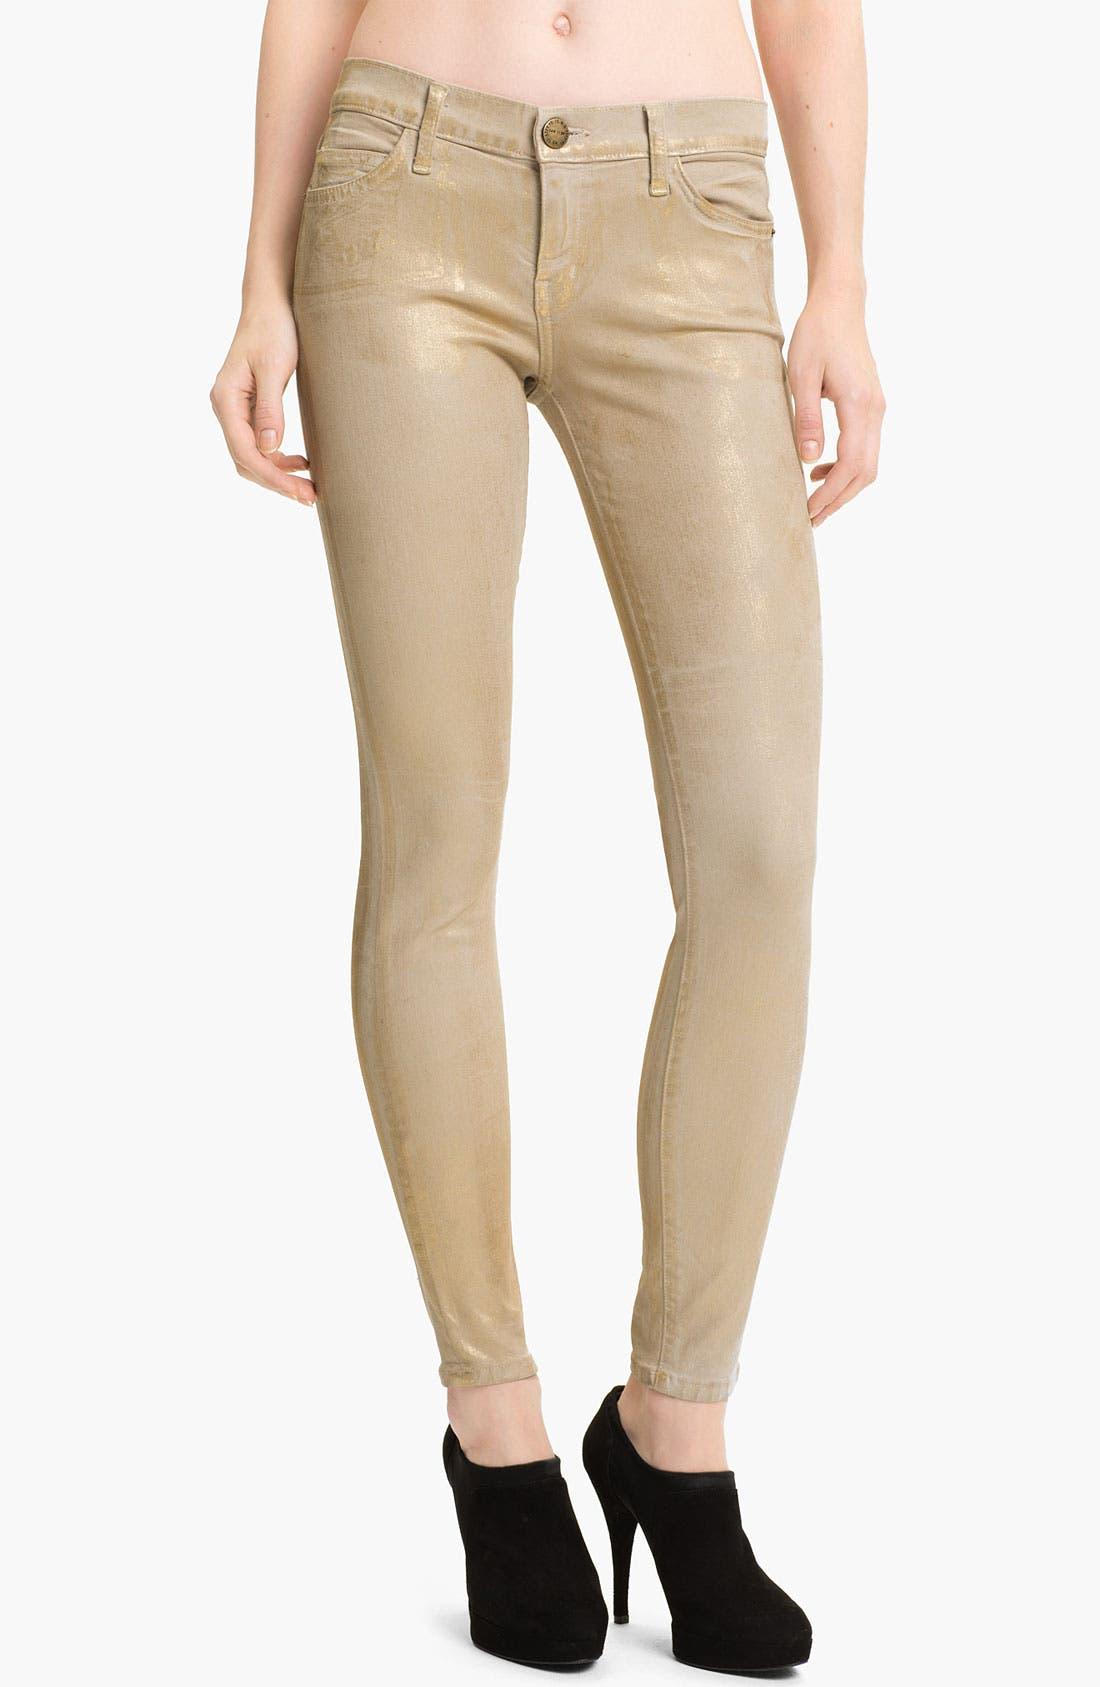 Alternate Image 1 Selected - Current/Elliott Skinny Ankle Jeans